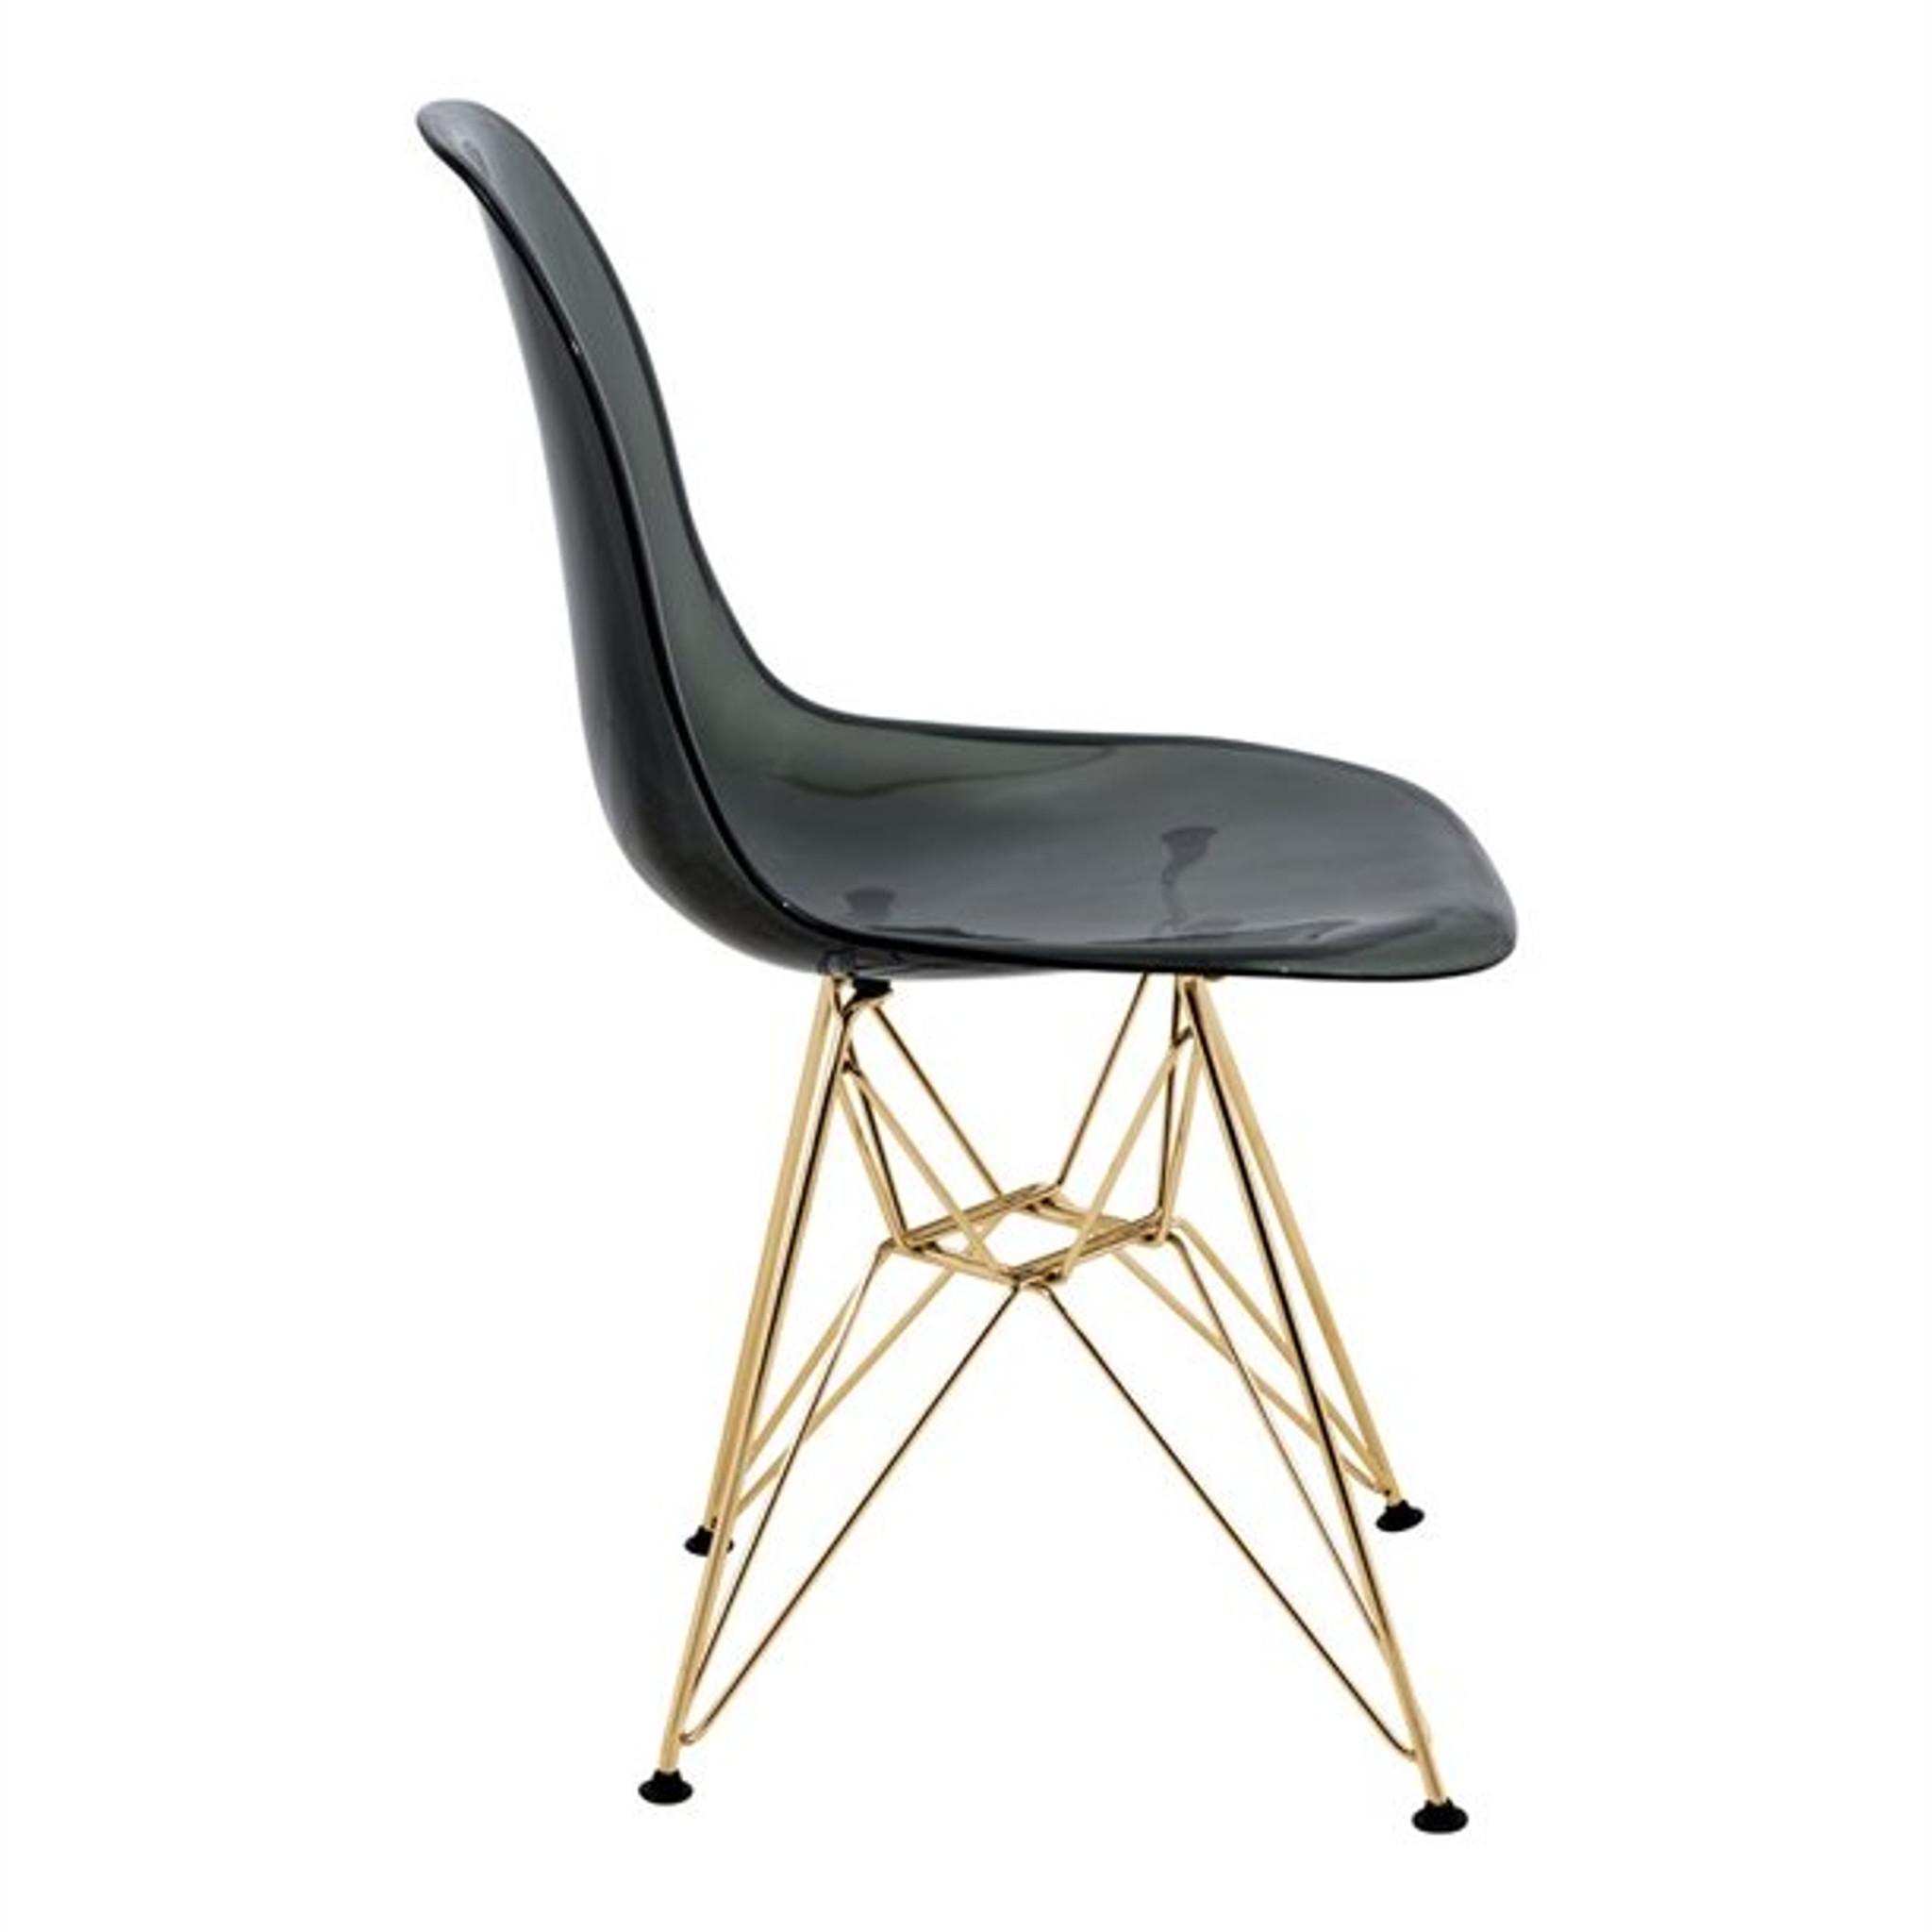 LeisureMod Cresco Modern Molded Eiffel Base Dining Side Chair-gold-Transparent Black